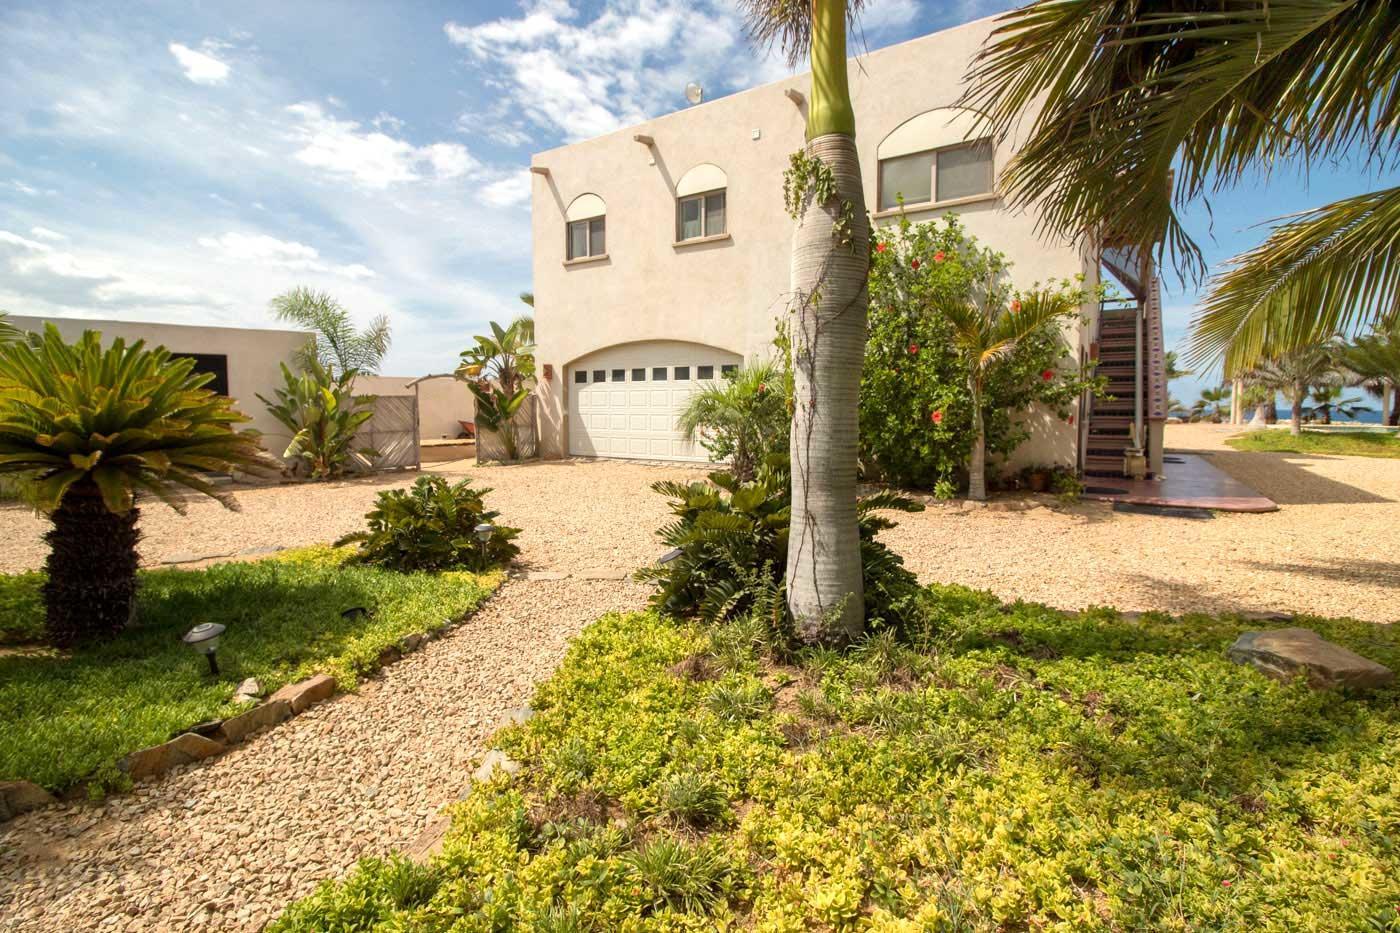 Rancho Nuevo Beachfront Home